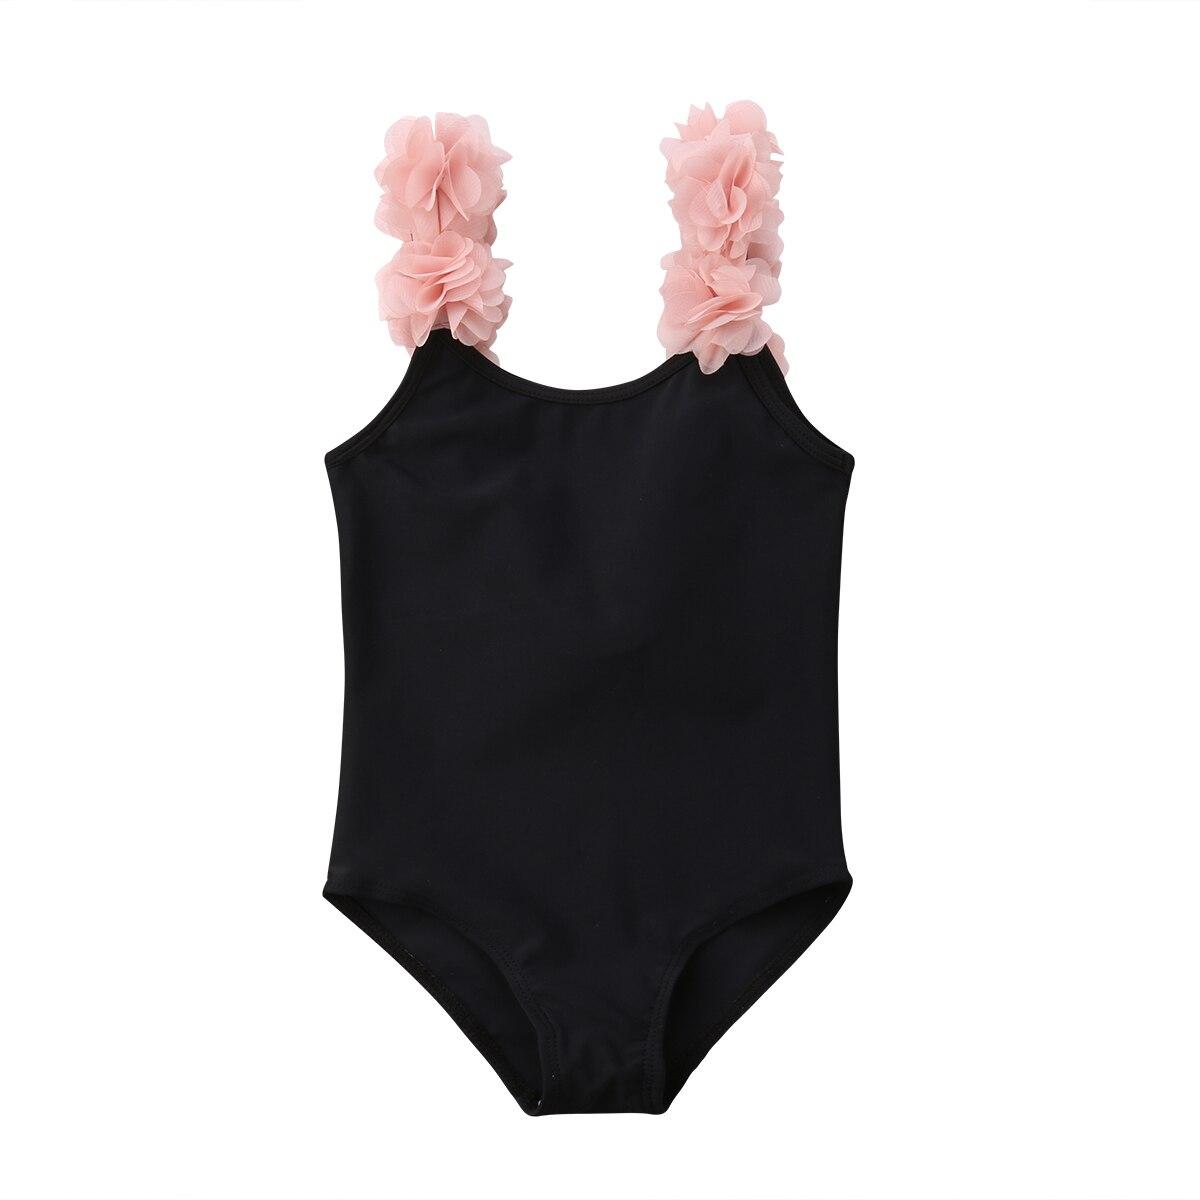 Black Kids Baby Girls Flower Ruffled Swimsuit Swimwear Bathing Suit Outfit